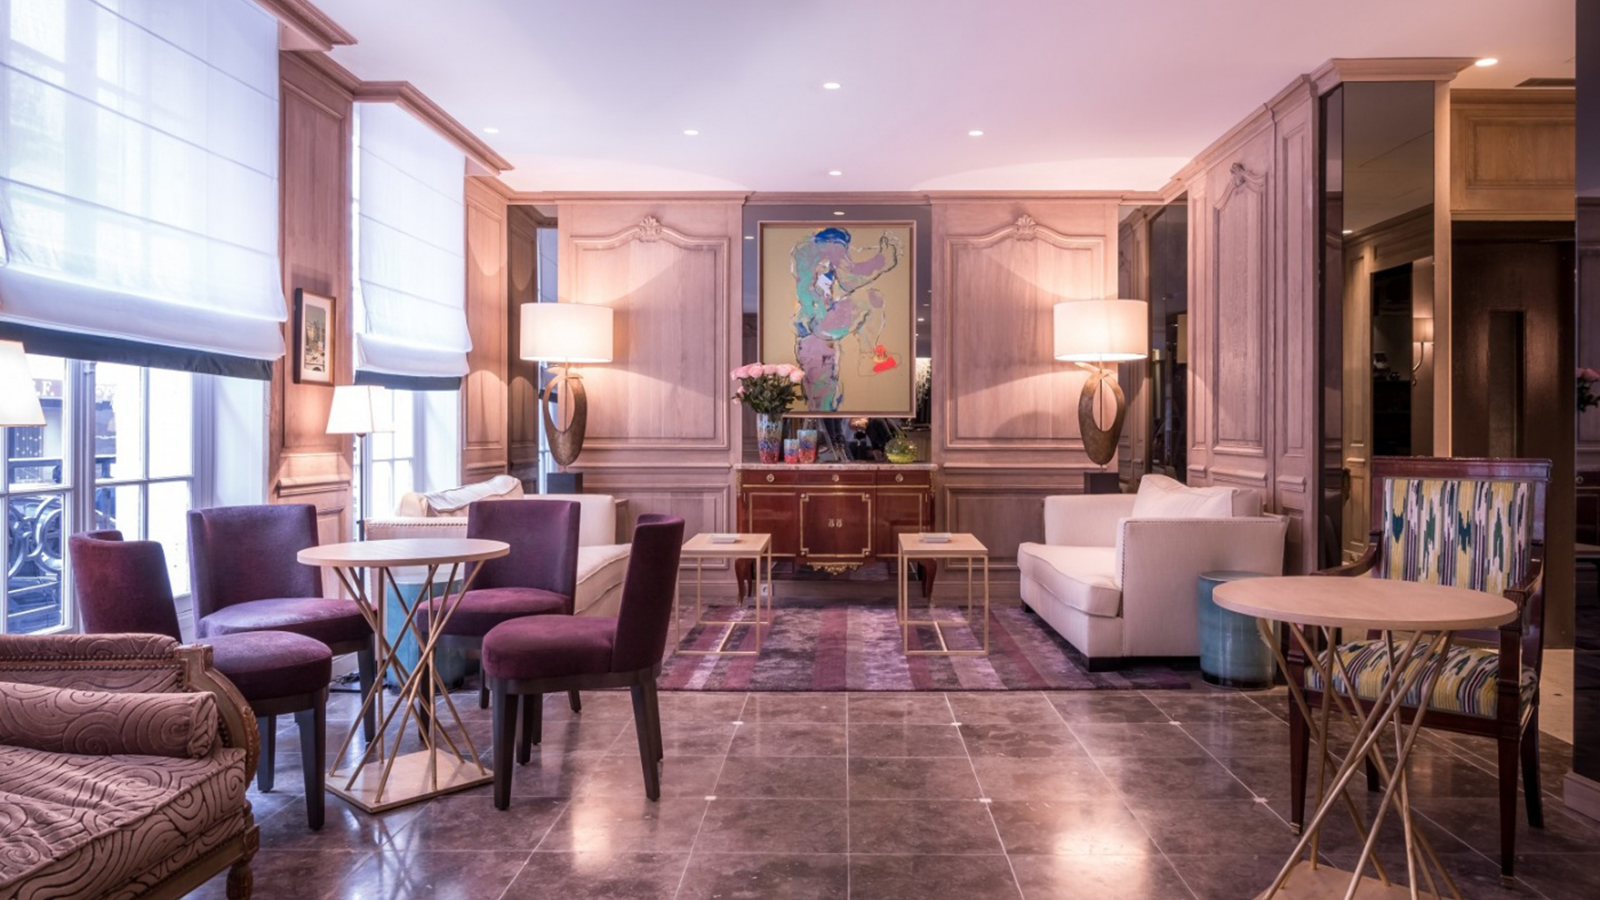 EFI Design Hotel Balmoral Paris Efi Design (6) 1176